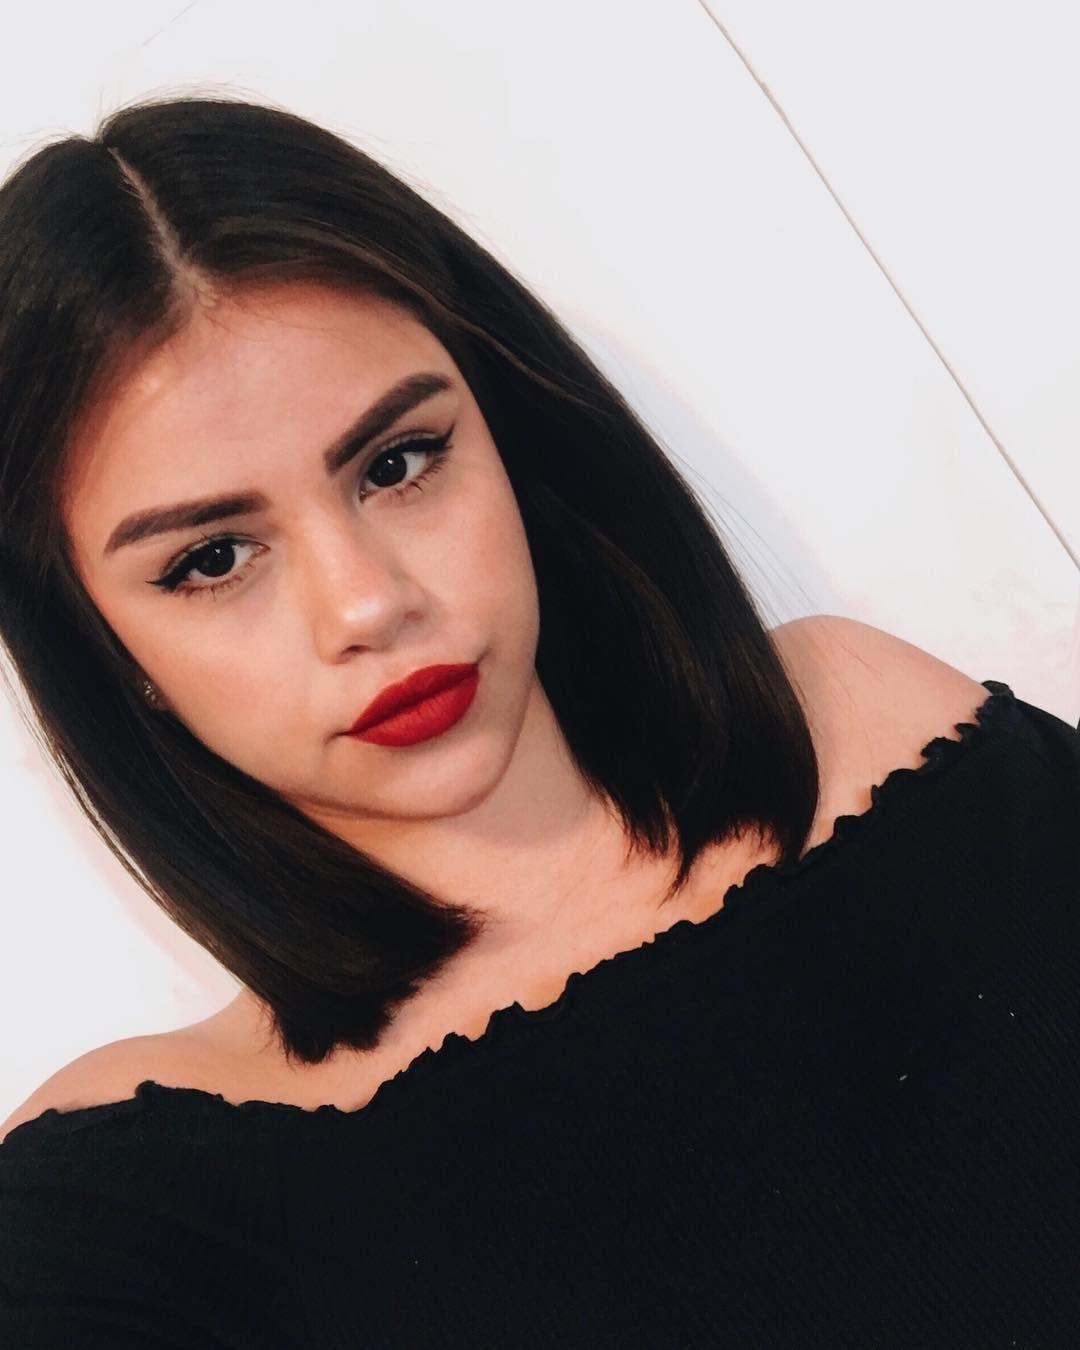 Pin By Yesenia Soto On Makeup Haircuts Straight Hair Vanessa Hudgens Short Hair Short Dark Hair